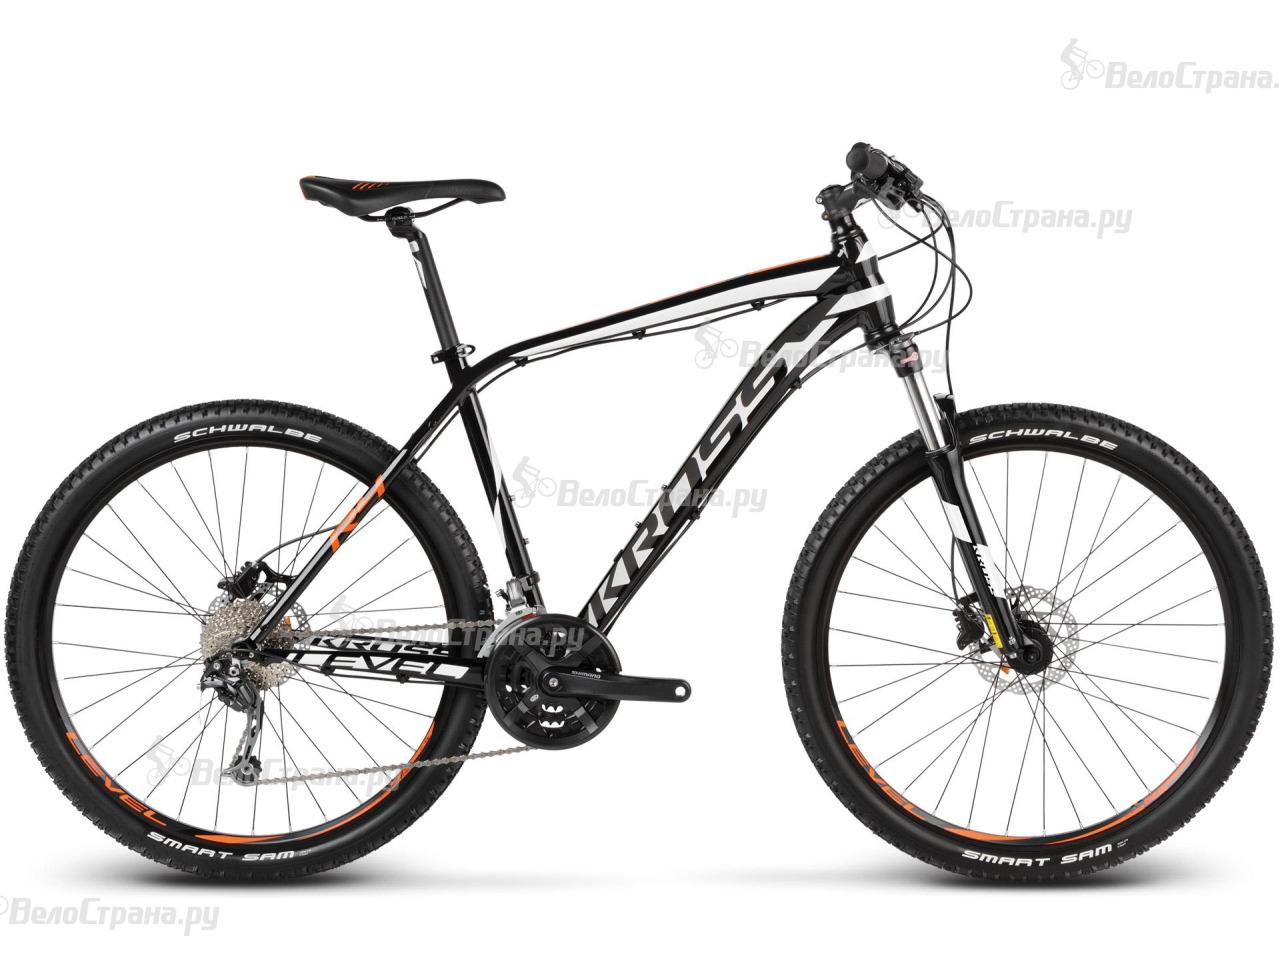 Велосипед Kross Level R4 (2017) r4 5a